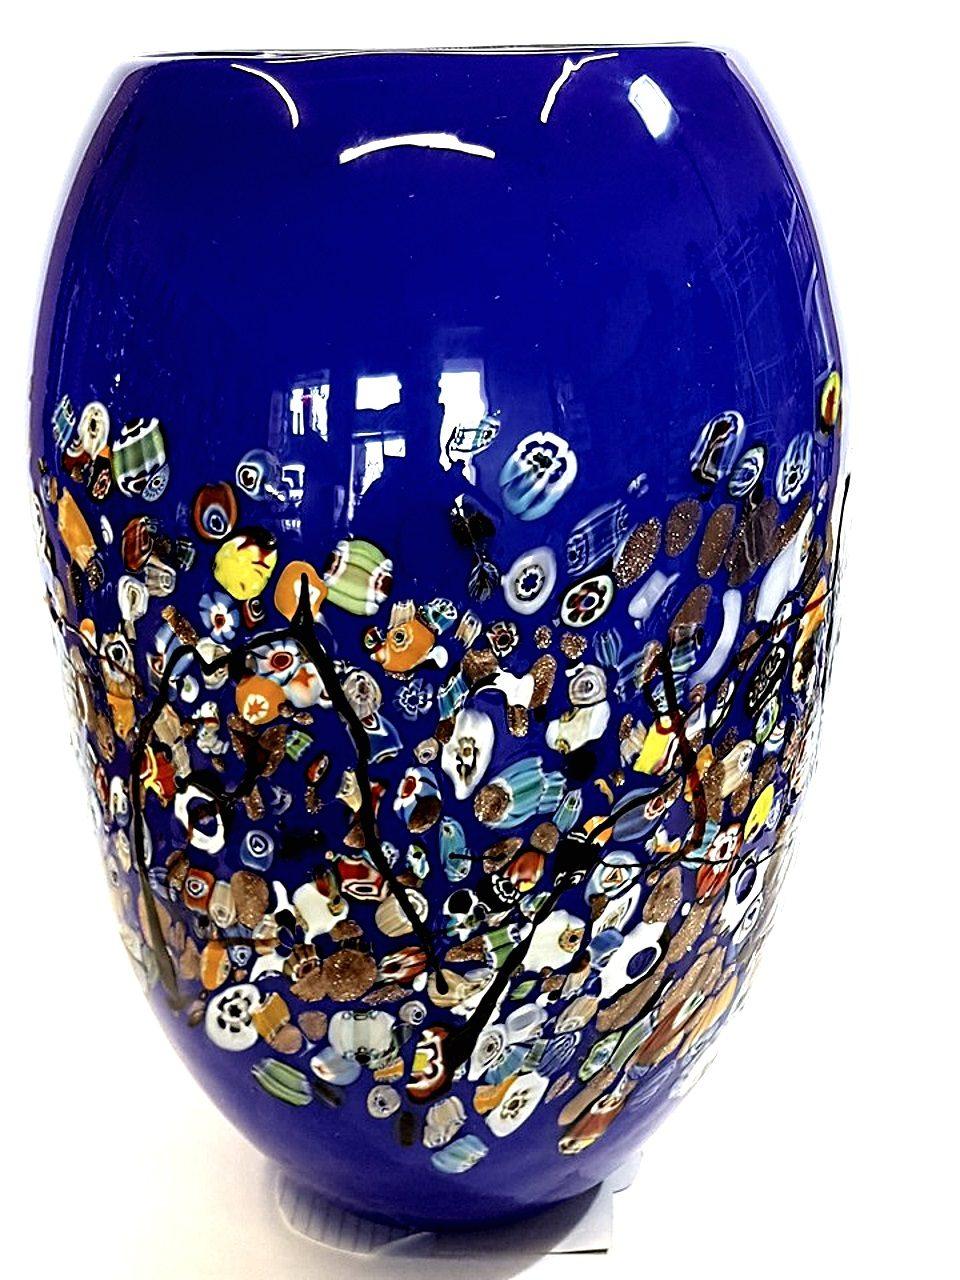 Vaso blu grande con murrine